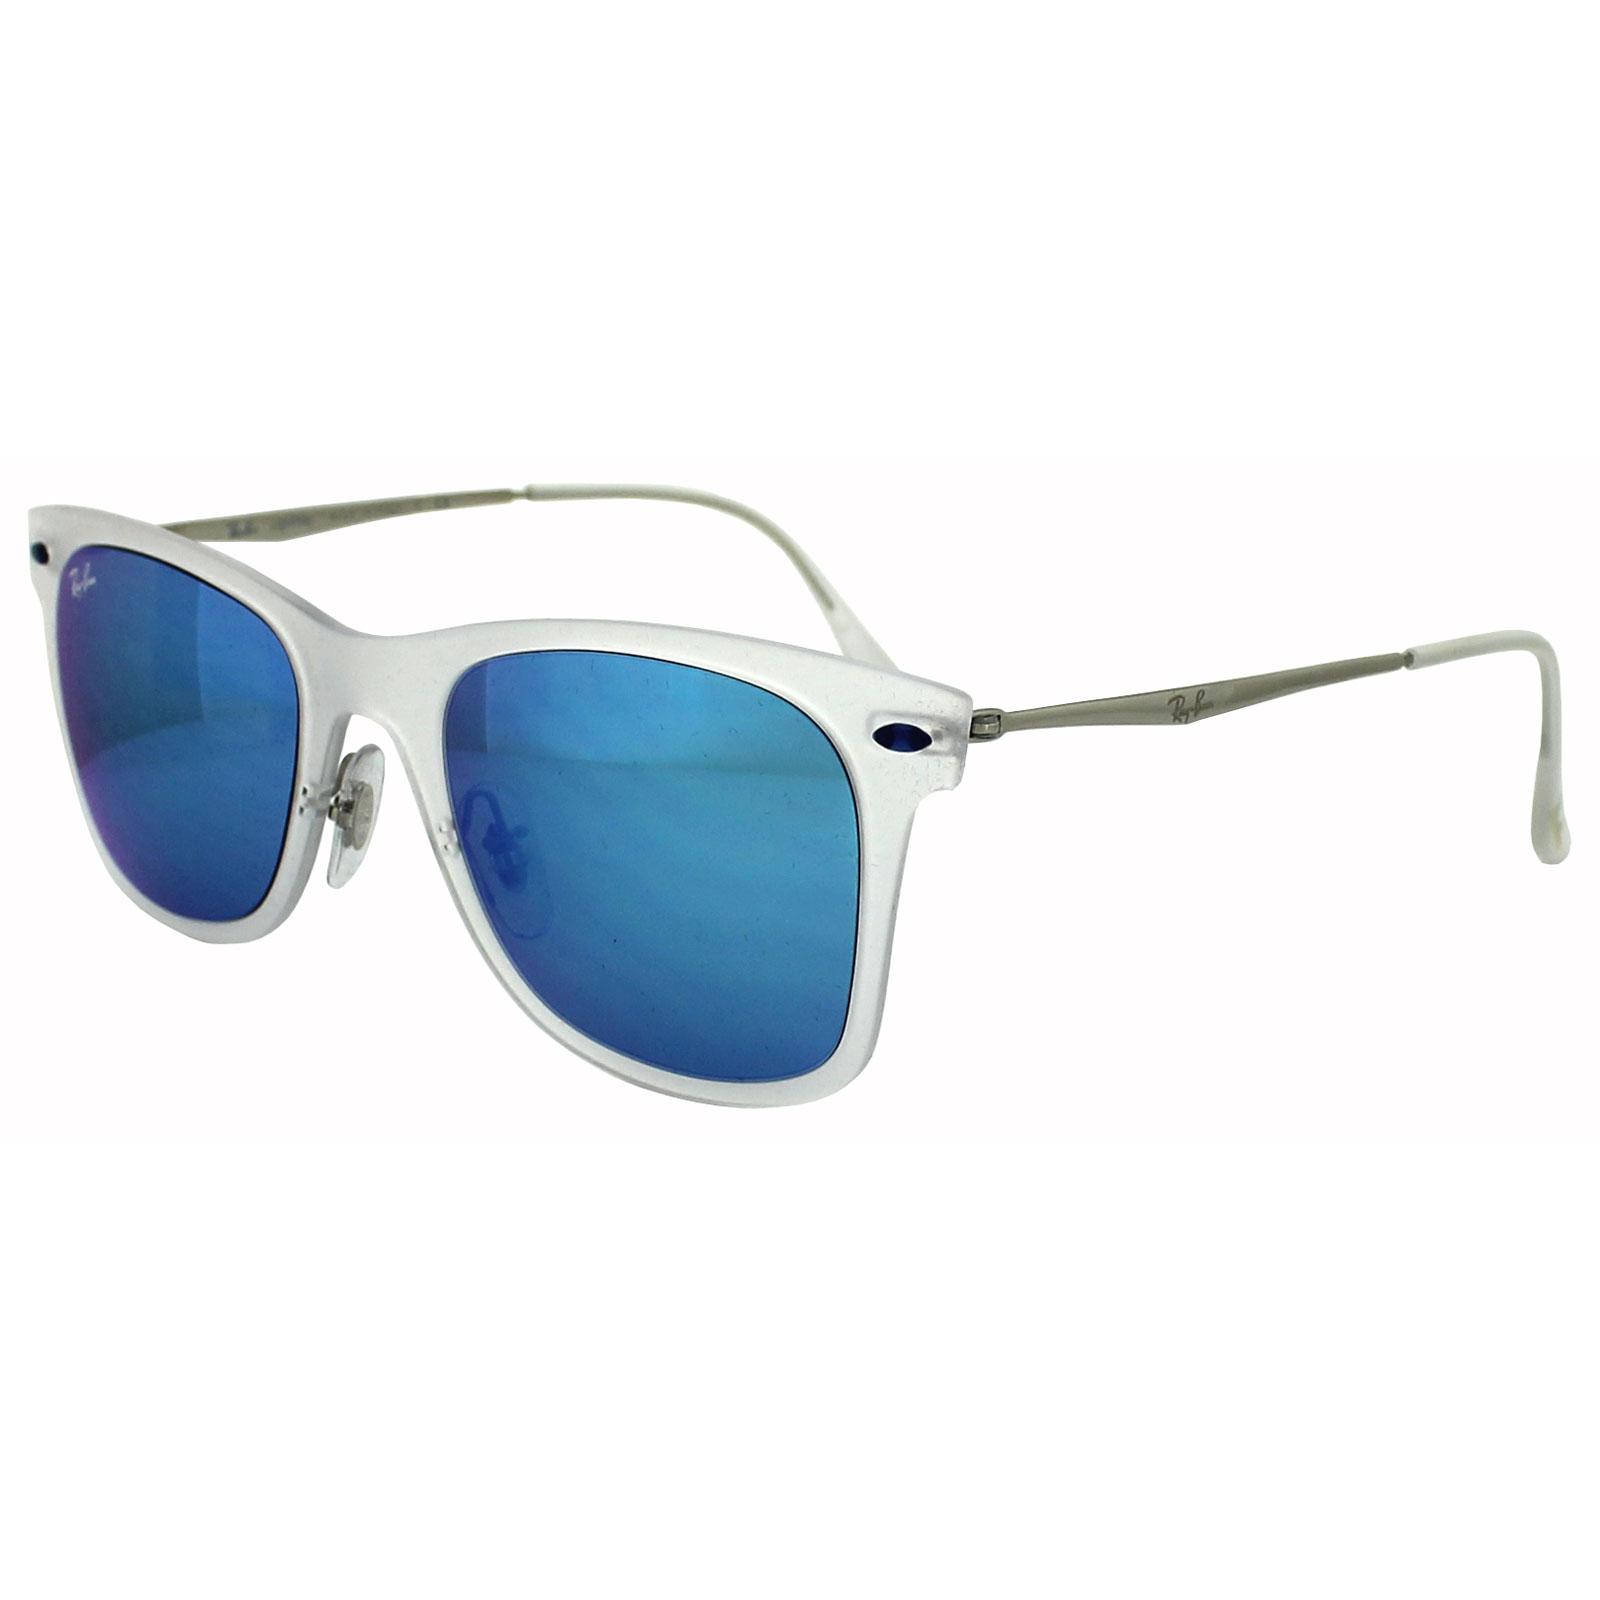 b278780bee555 Sentinel Ray-Ban Sunglasses Wayfarer Light Ray 4210 646 55 Transparent Blue  Mirror